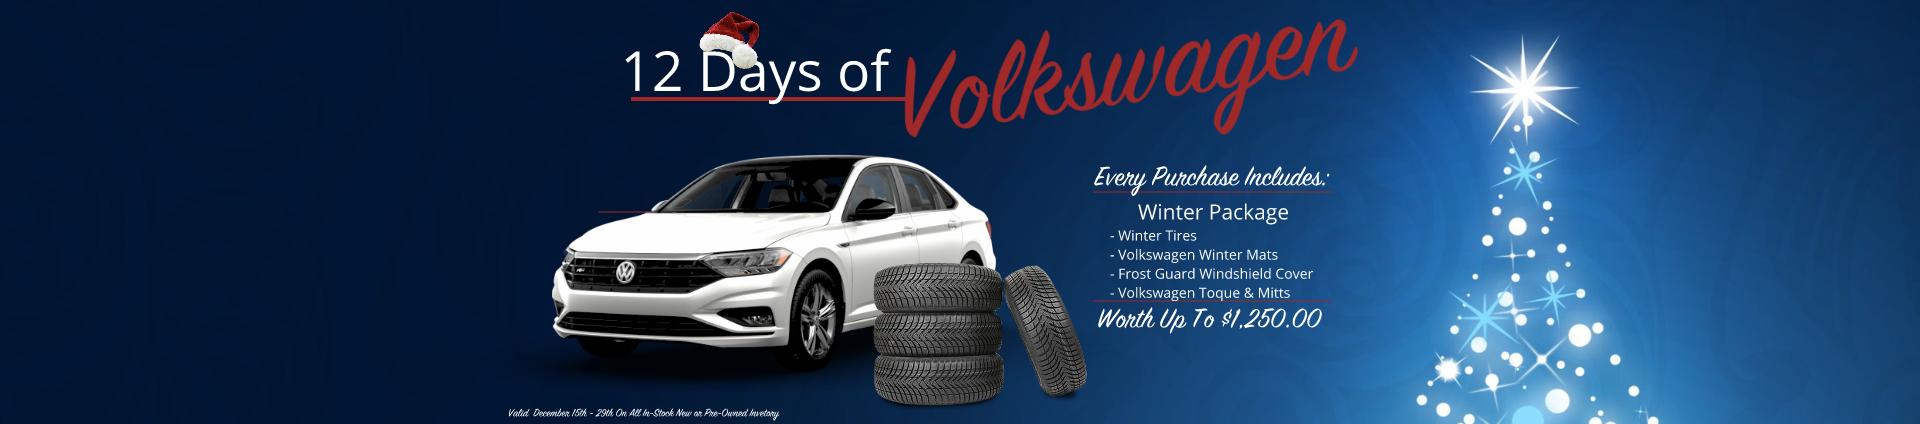 12 days Volkswagen